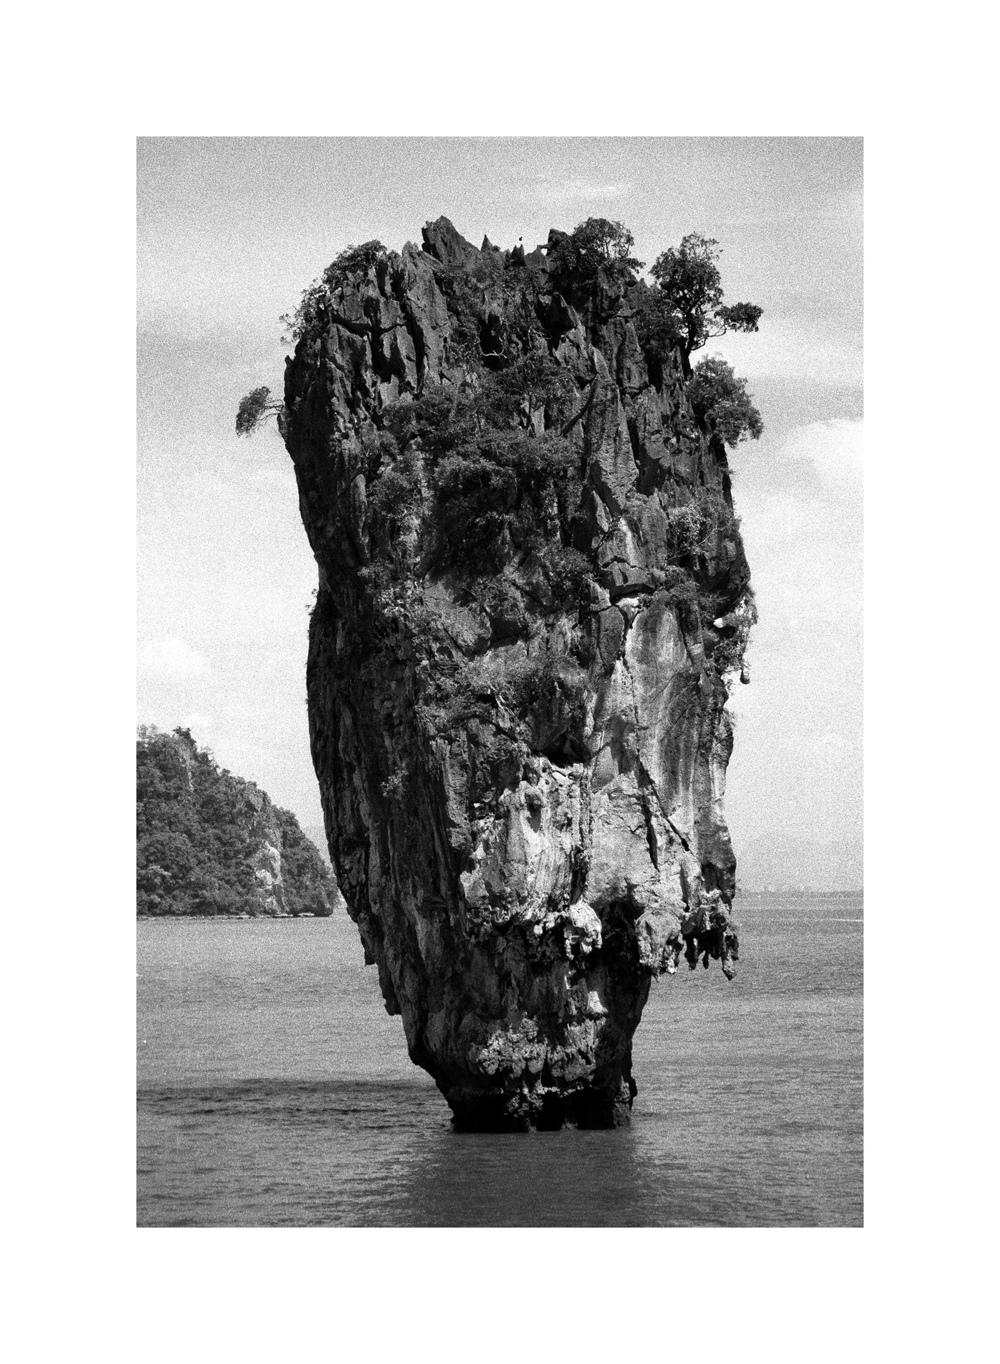 Matusik Travel-Nature 0033